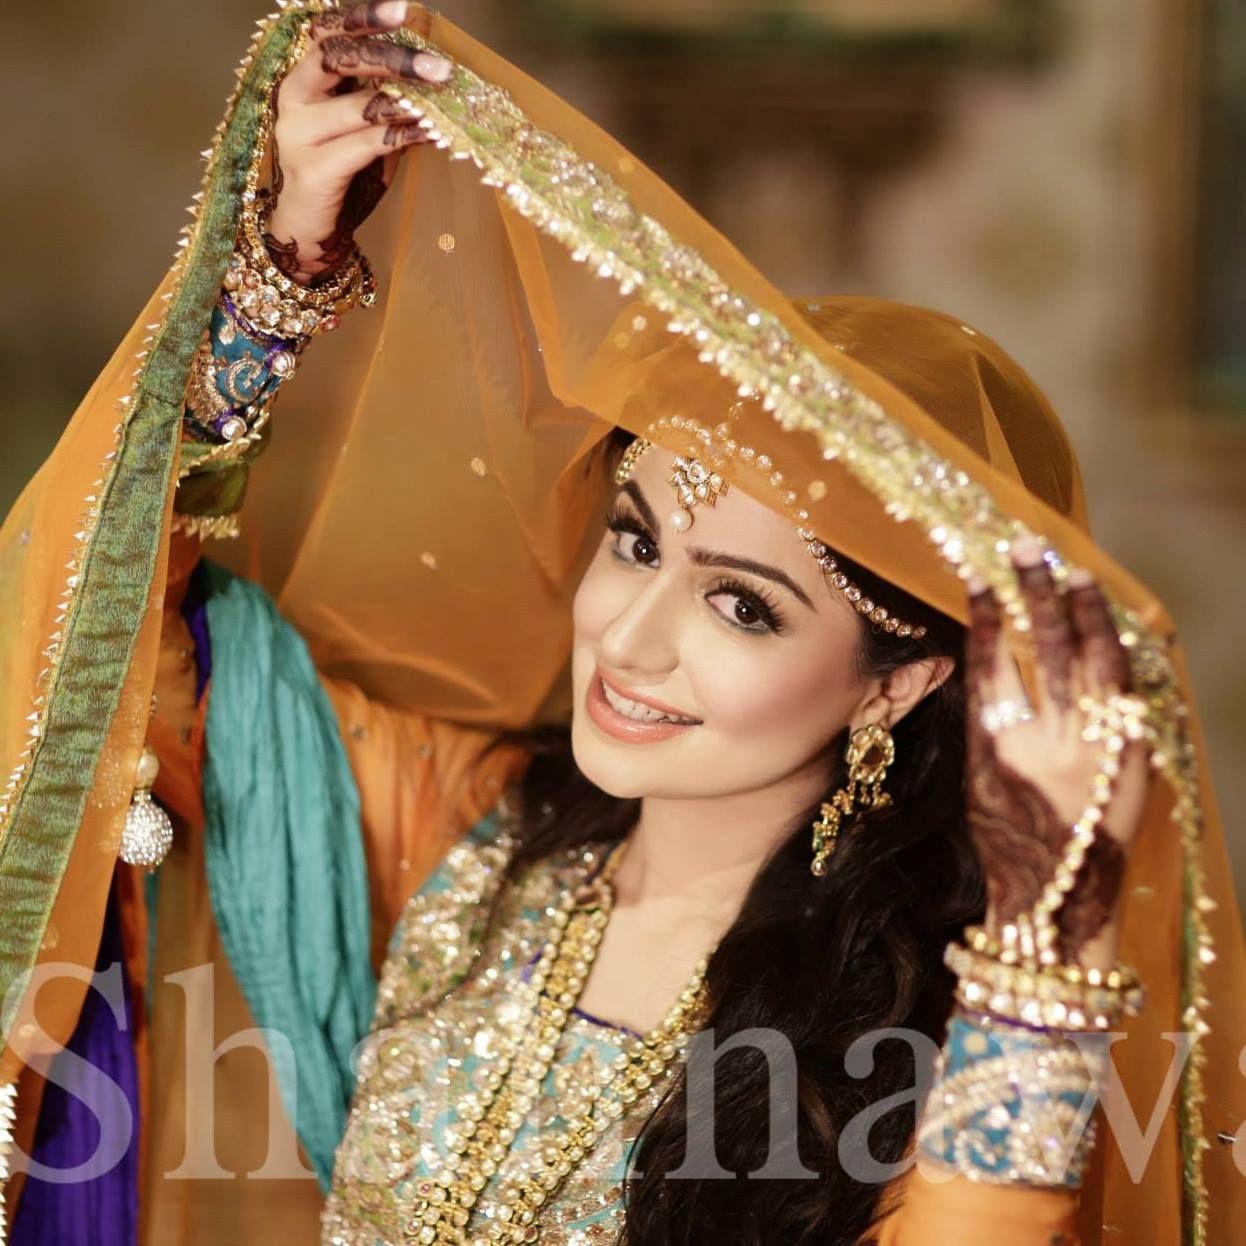 Mehndi Bride Poses : Mehndi bride shahnawaz studio photography wedding